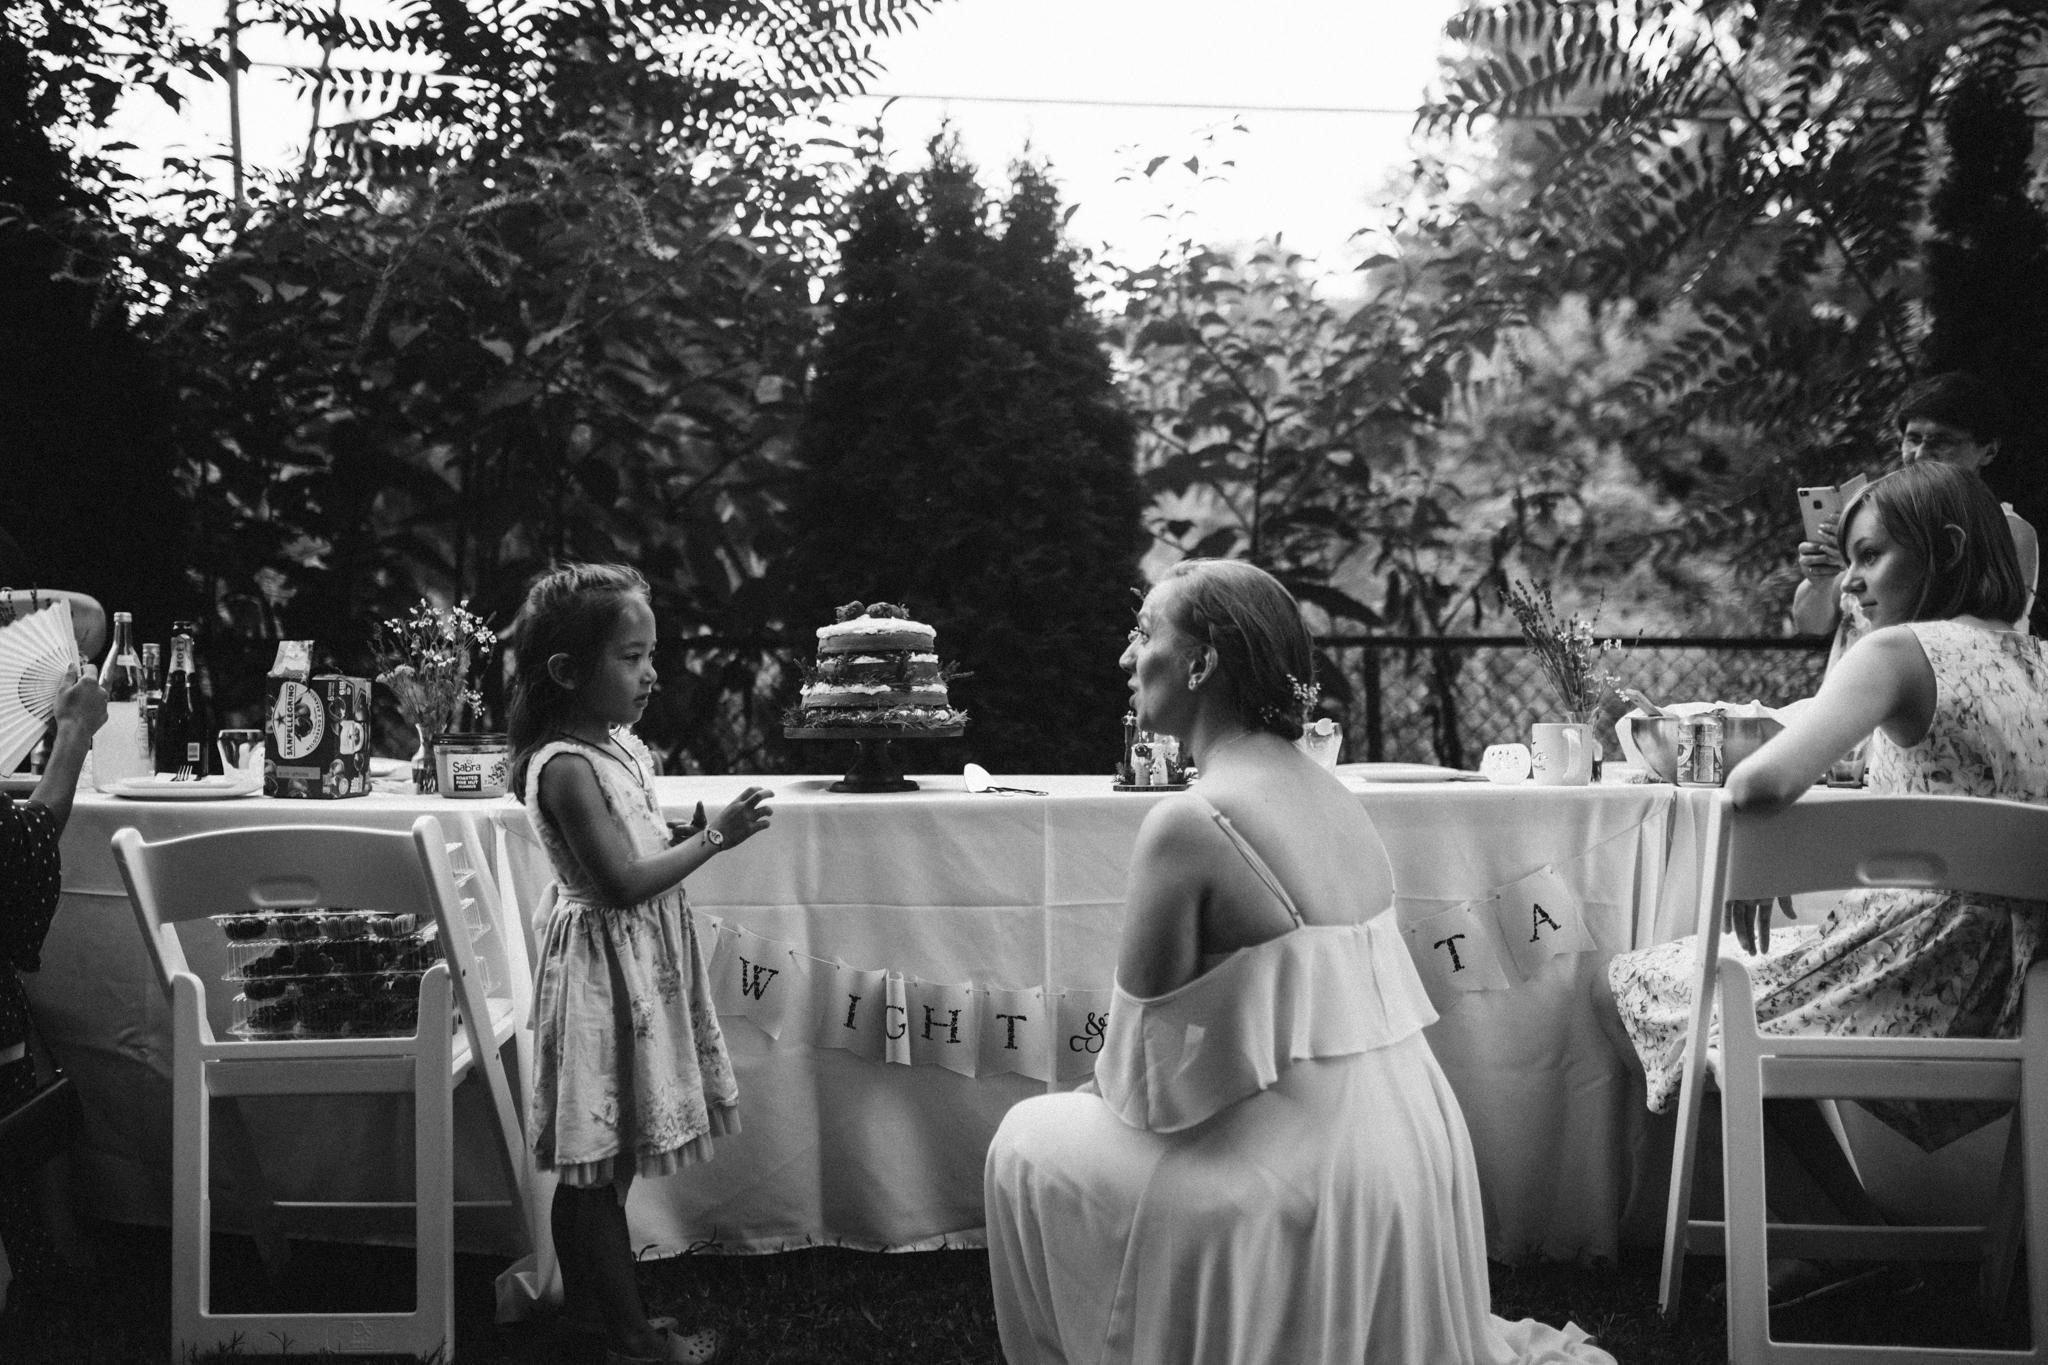 dorota_dwight_richmond_backyard_wedding-100.jpg